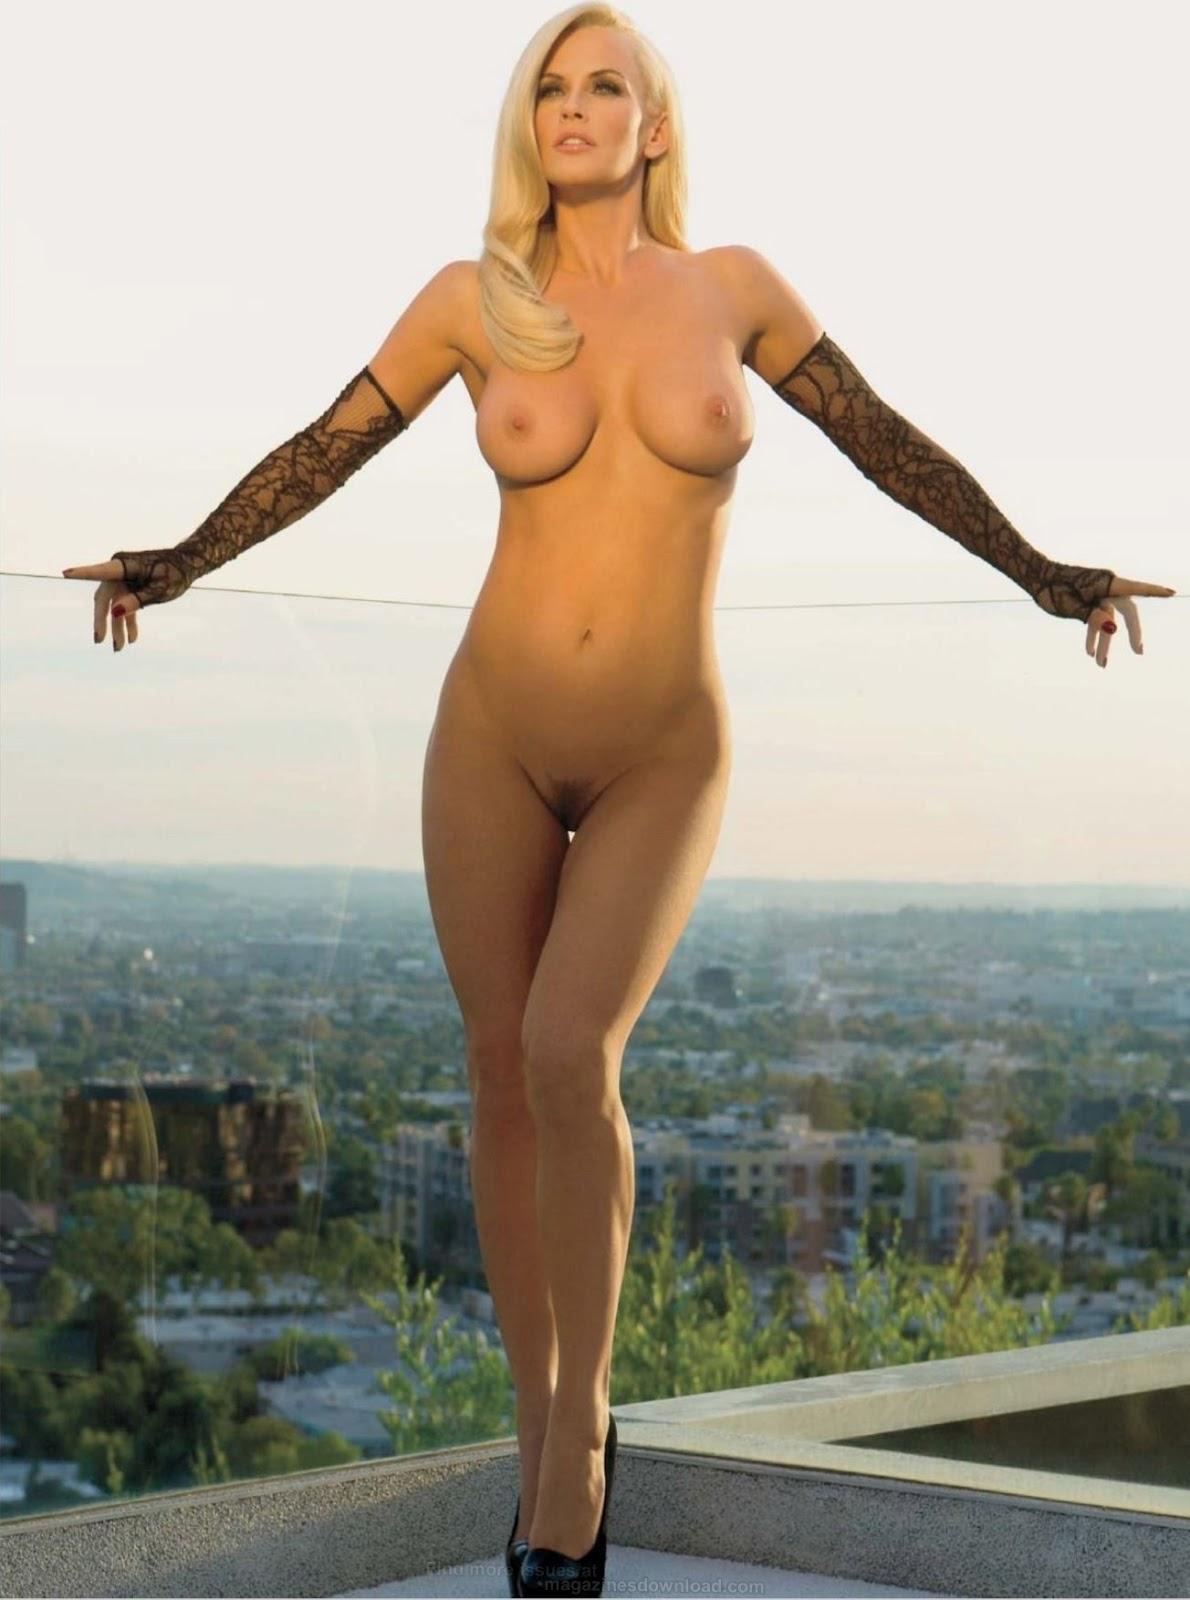 http://3.bp.blogspot.com/-QXDNKPusicc/T_FSrvDPEwI/AAAAAAAAA8k/sSae5aFCVwU/s1600/Jenny+McCarthy+Playboy+2012+(8).jpg